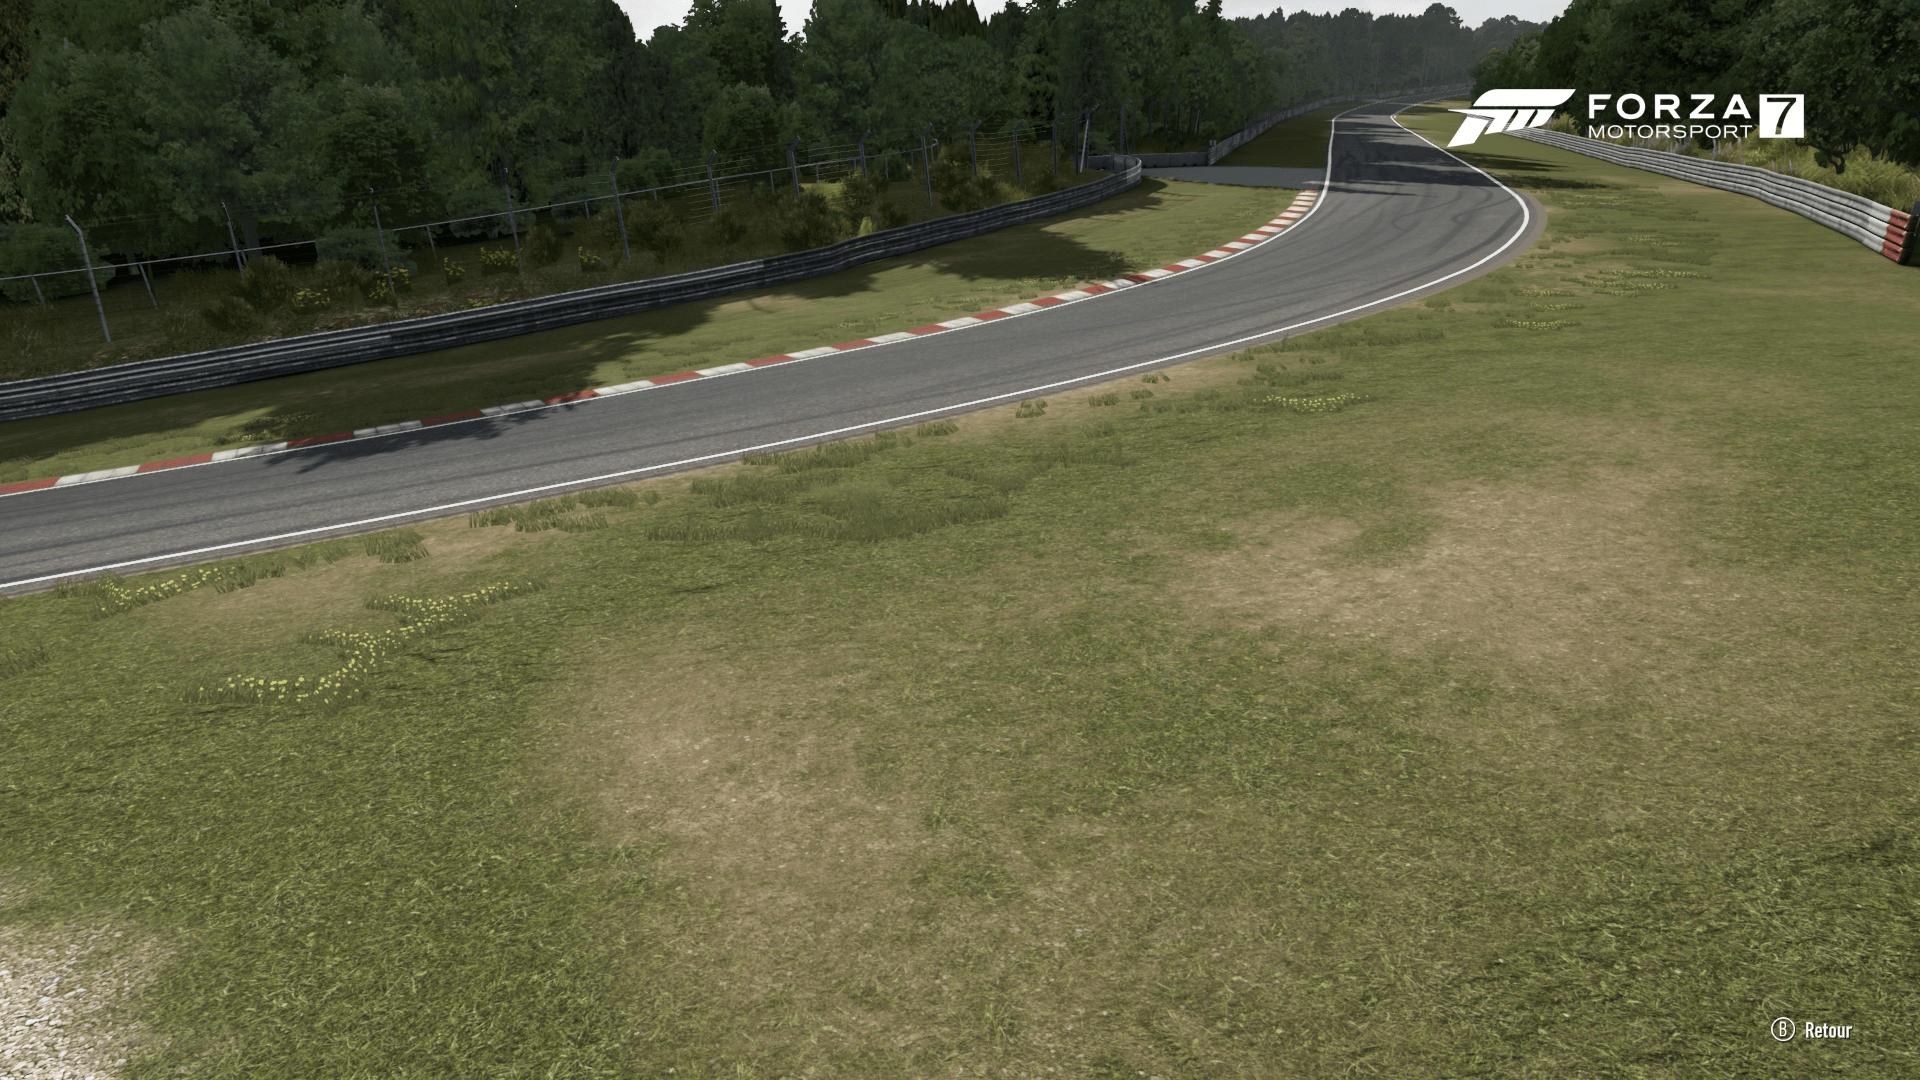 Graphismes Nurburgring Forza 7